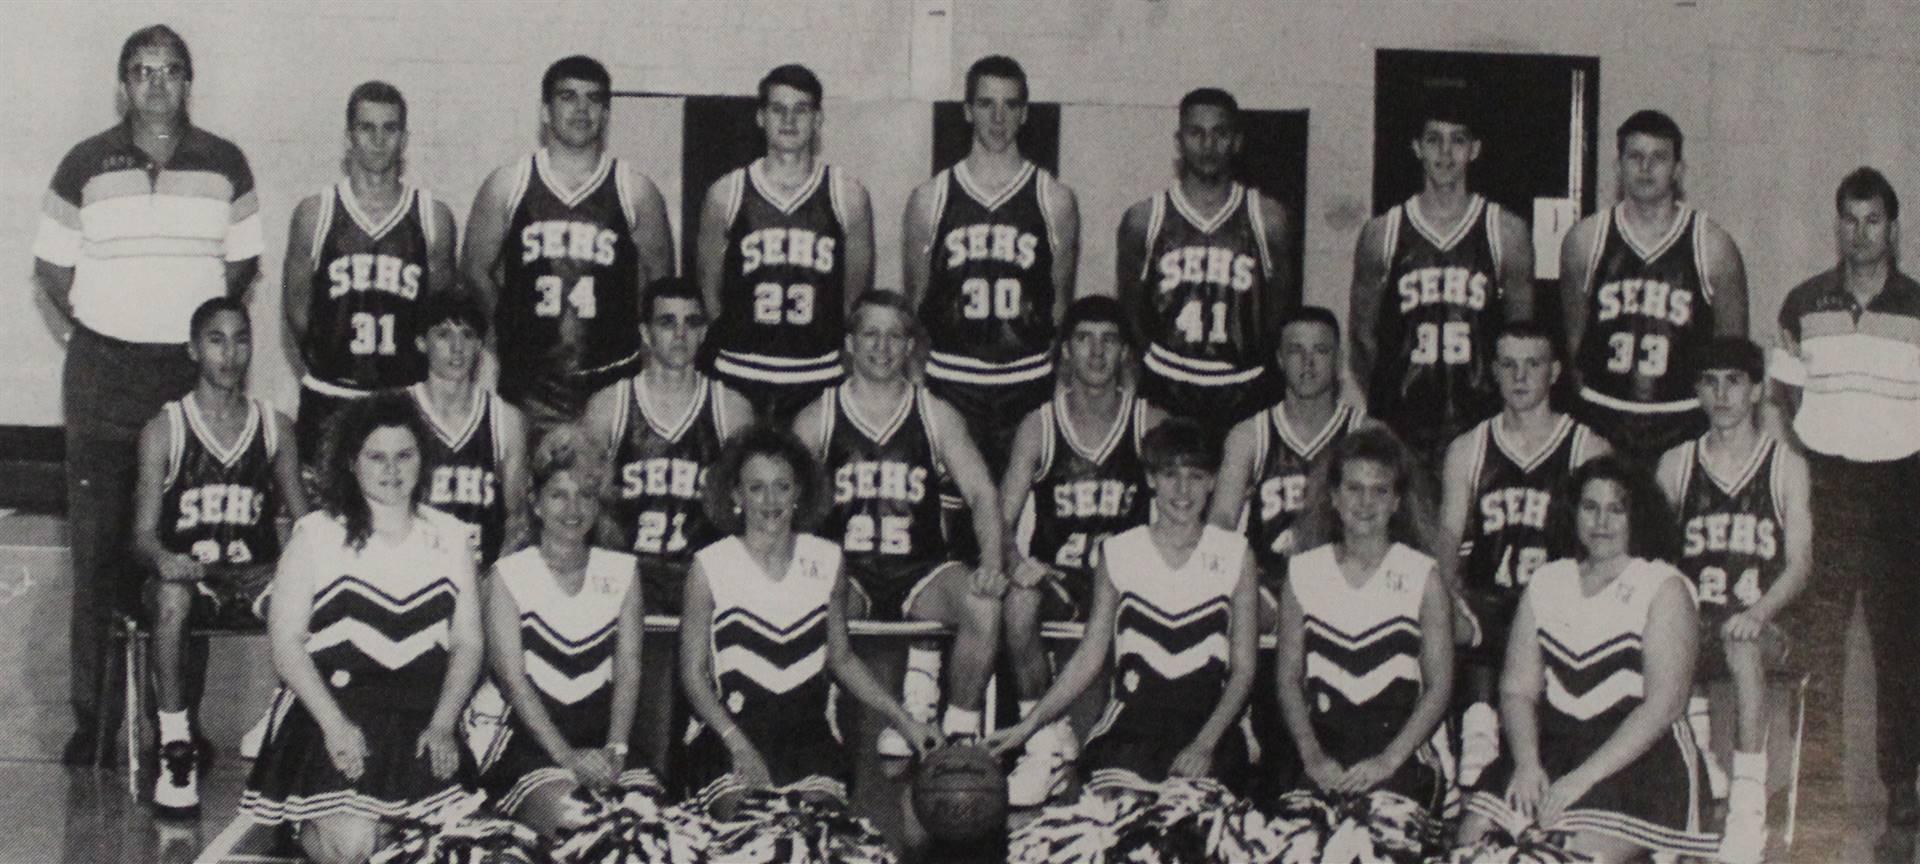 1993 Boys Basketball